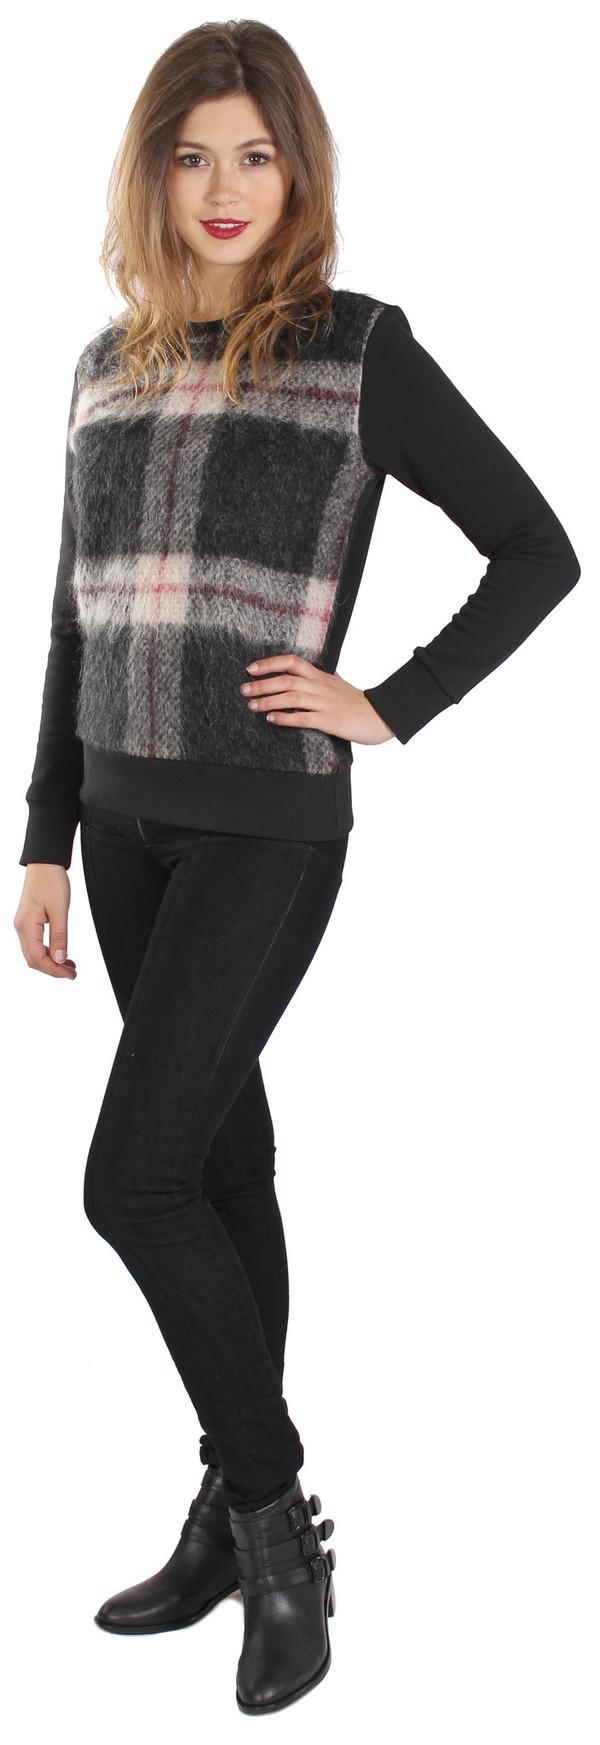 Sonia Rykiel Check Mohair Mix Sweatshirt